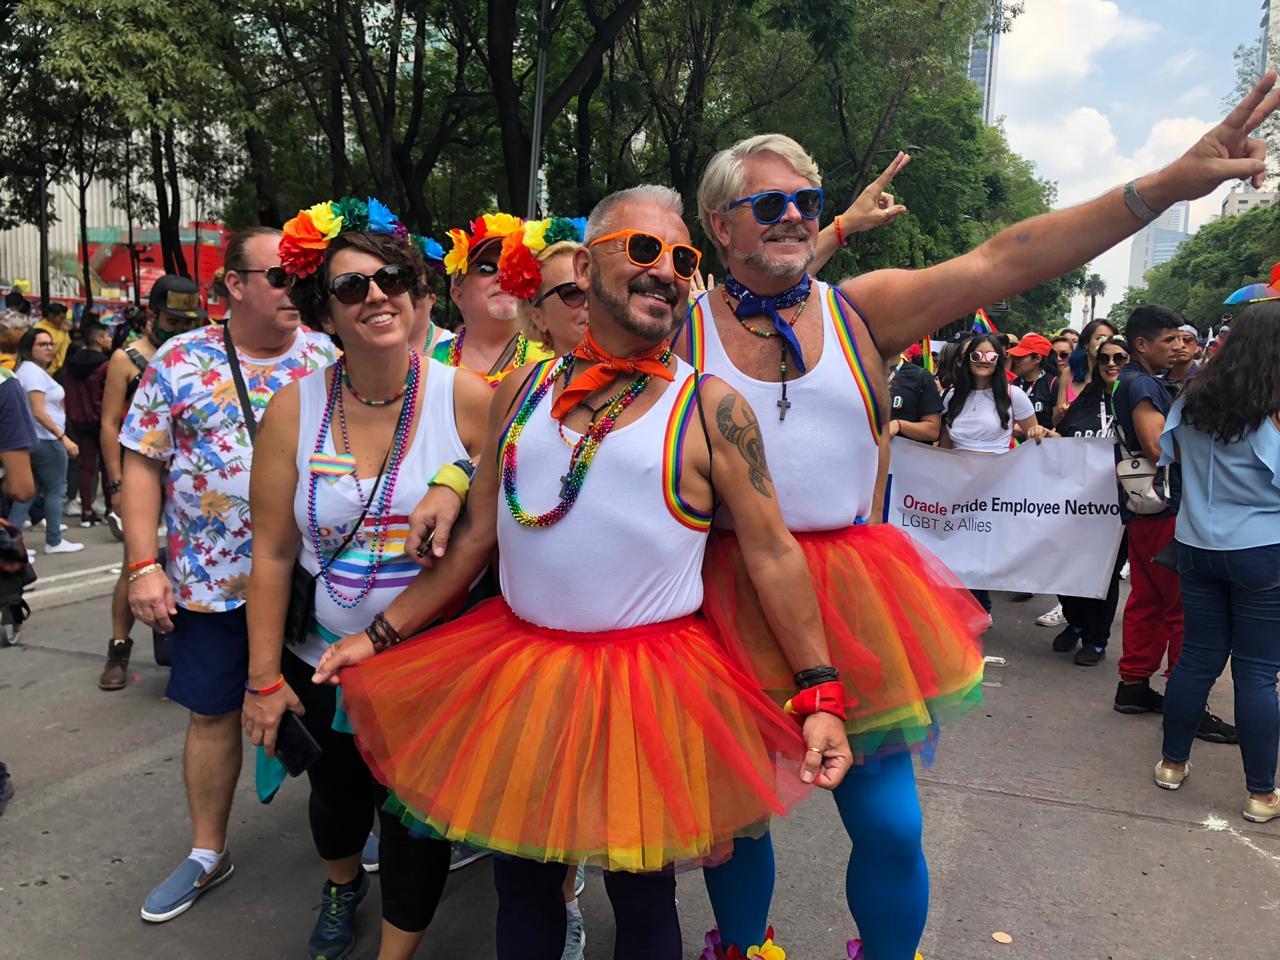 fiesta orgullo gay 2019